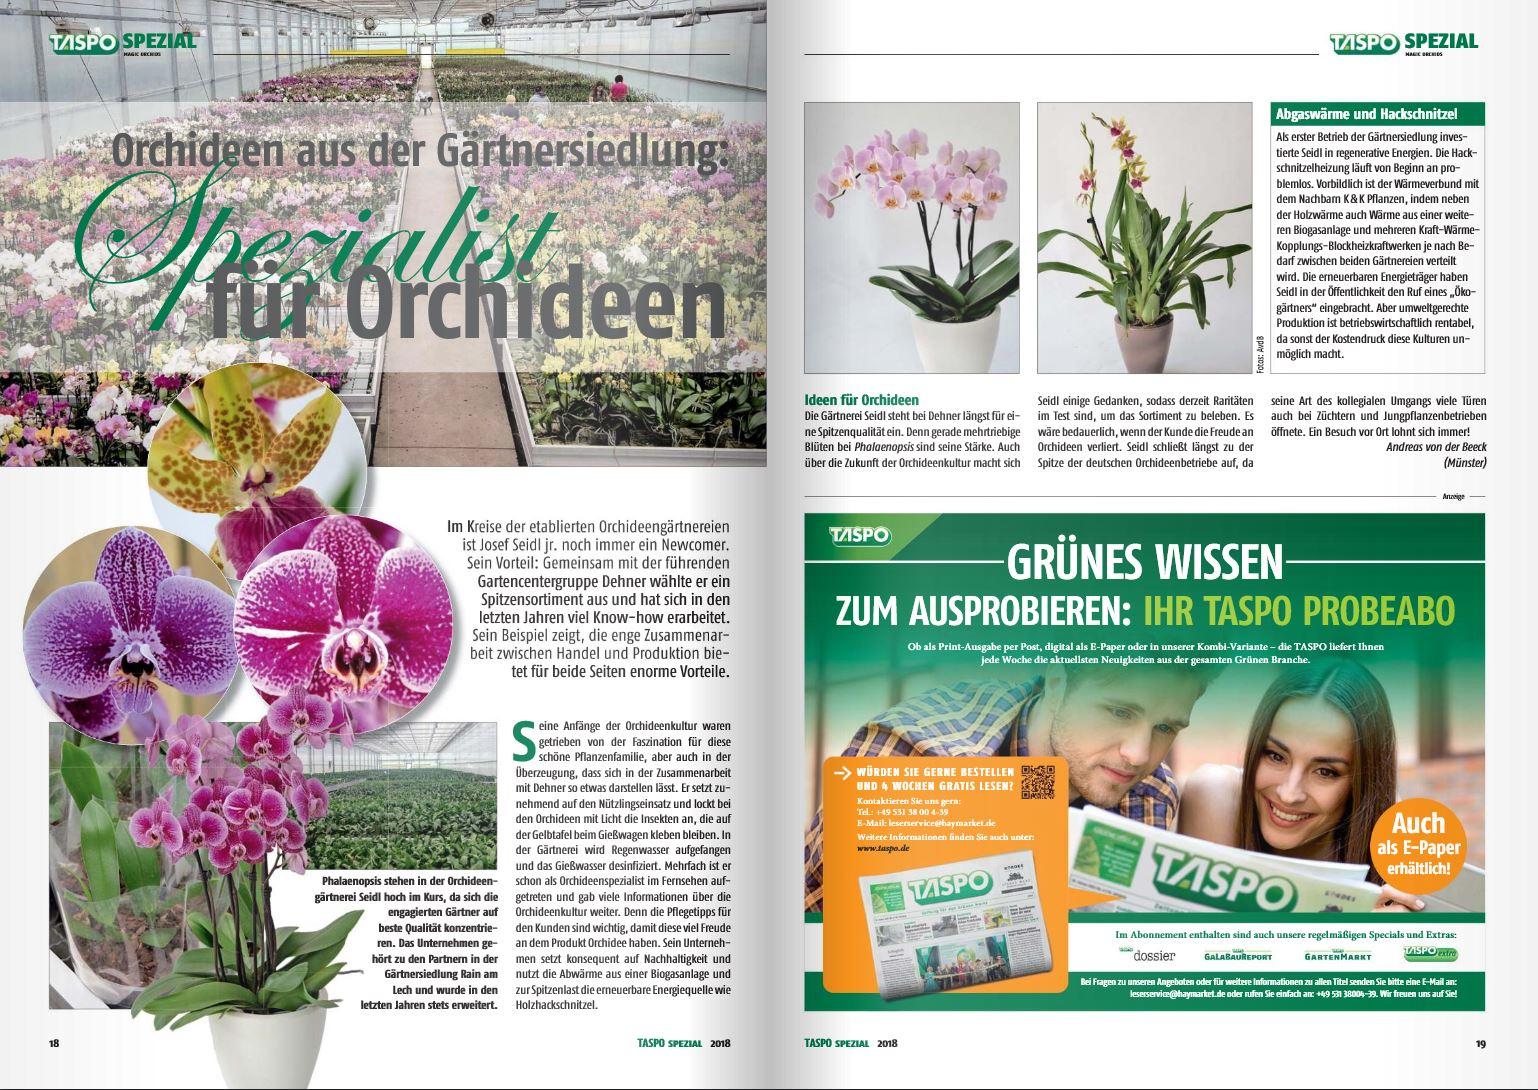 2018-08-31 Taspo Spezial Orchideen